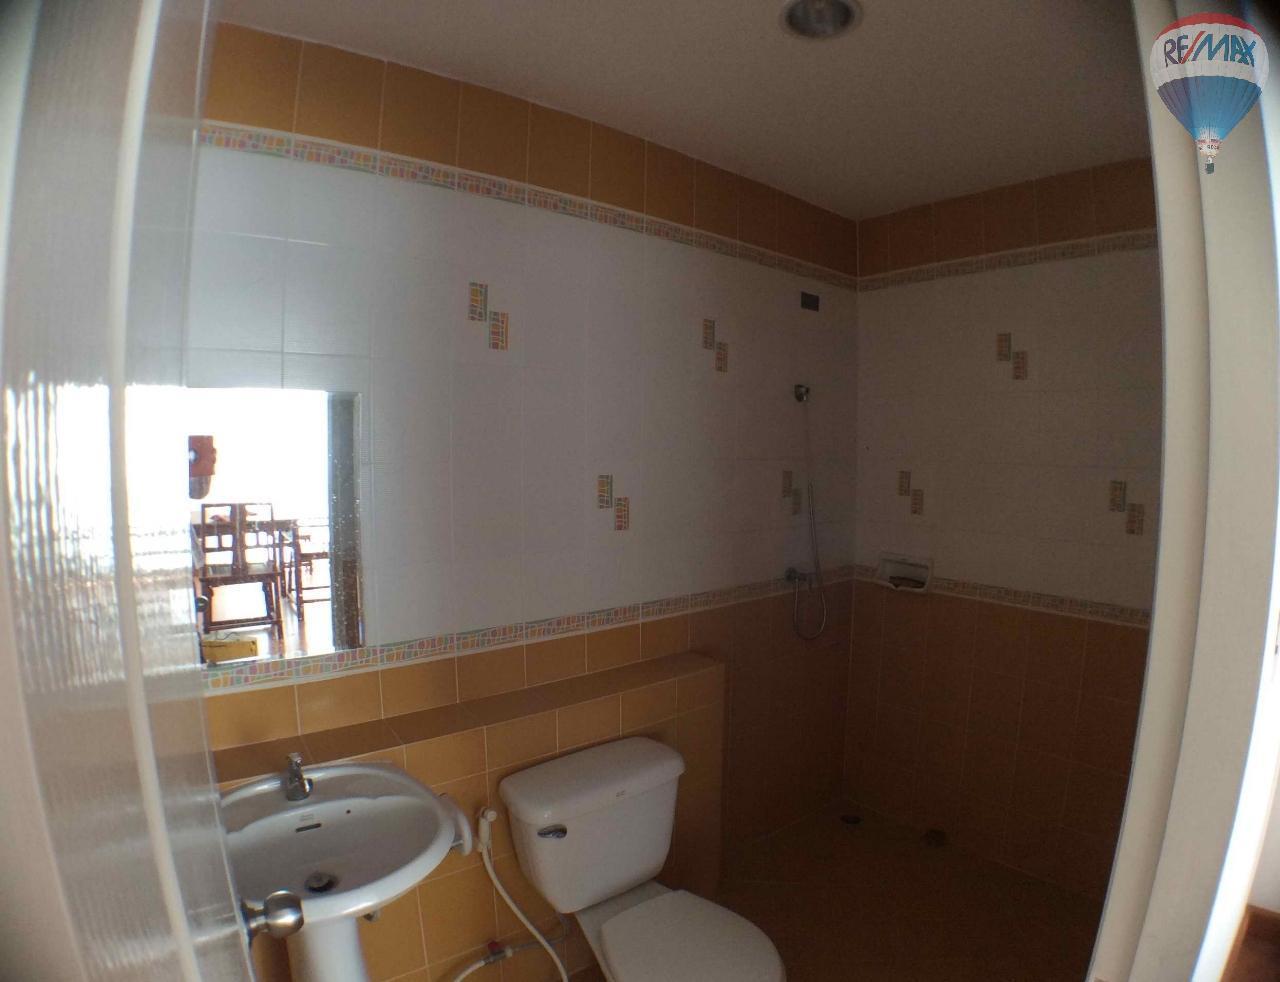 RE/MAX BestLife Agency's The Enter home office for sale on soi Kanchanaphisek 39 15